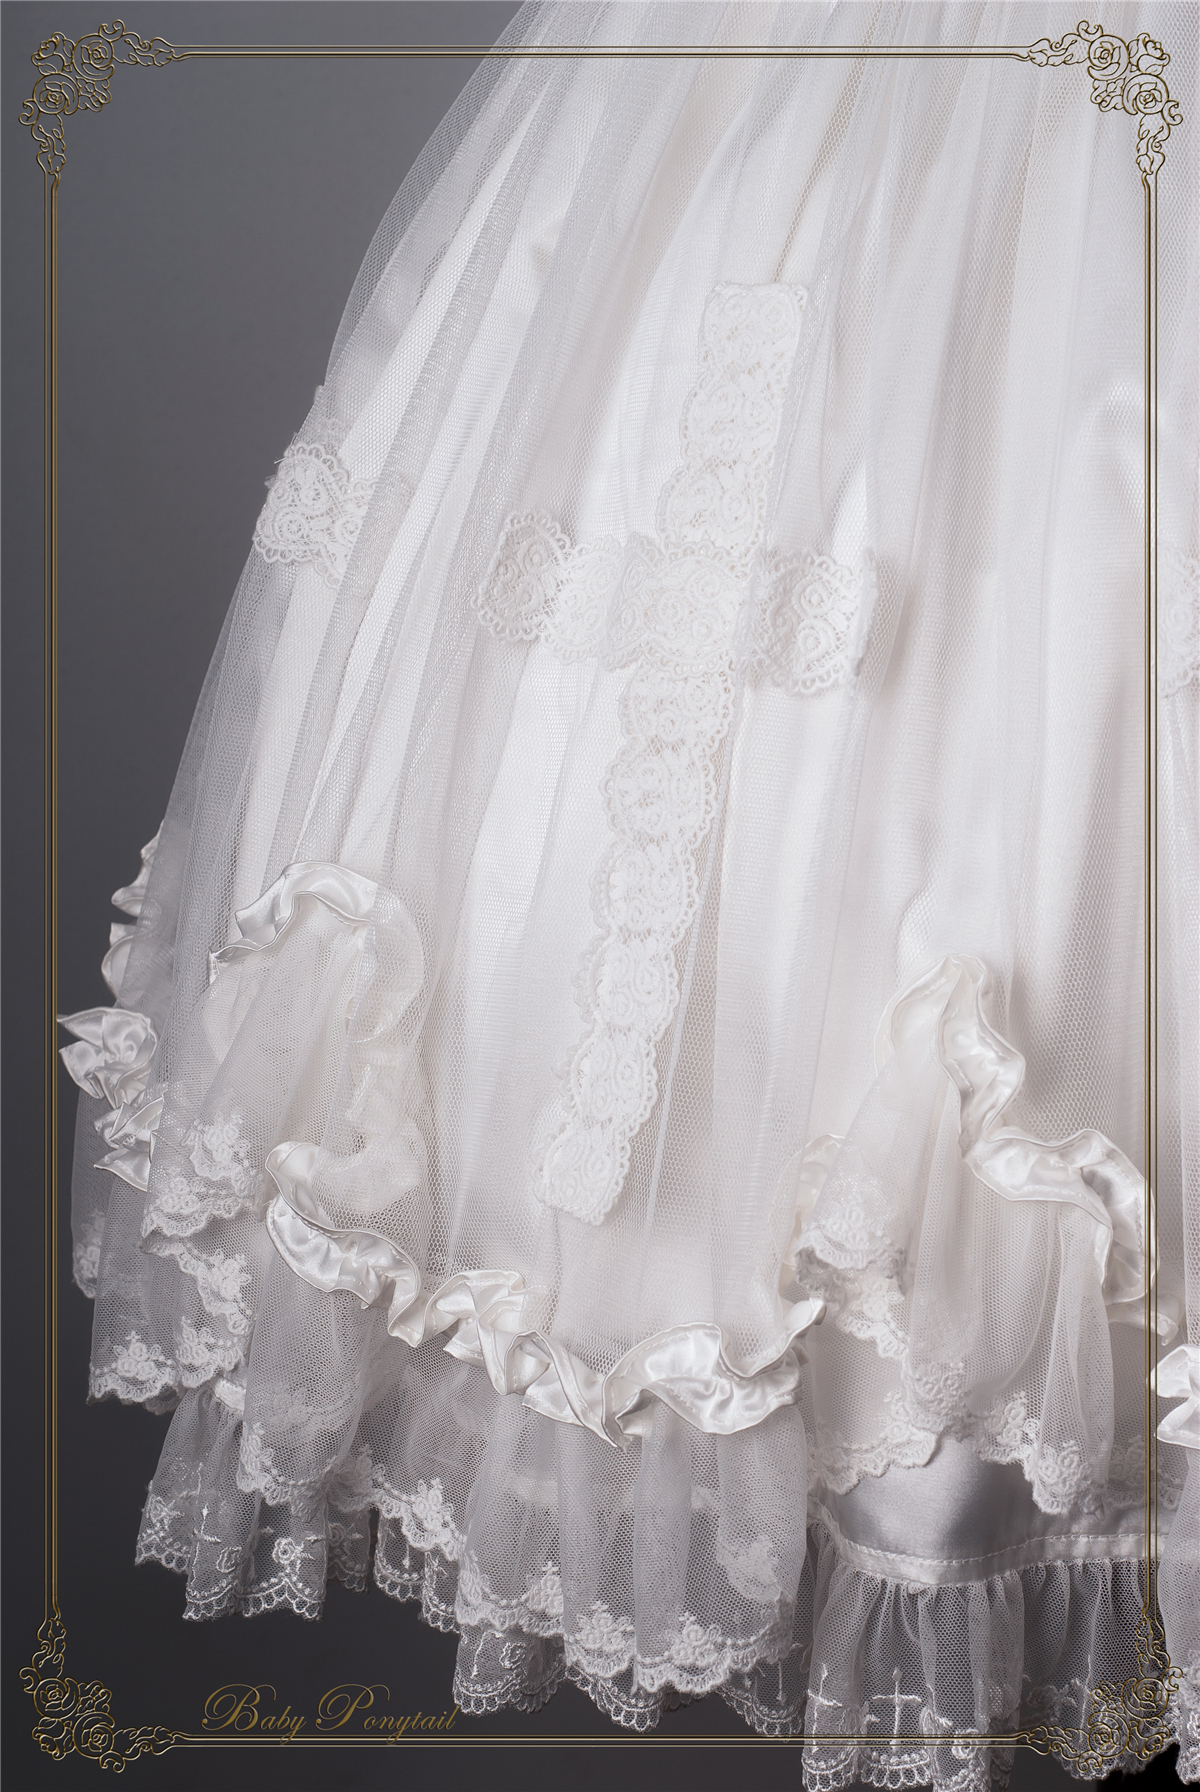 Babyponytail_Heavenly Teardrops_JSK White Stock Photo_13.jpg